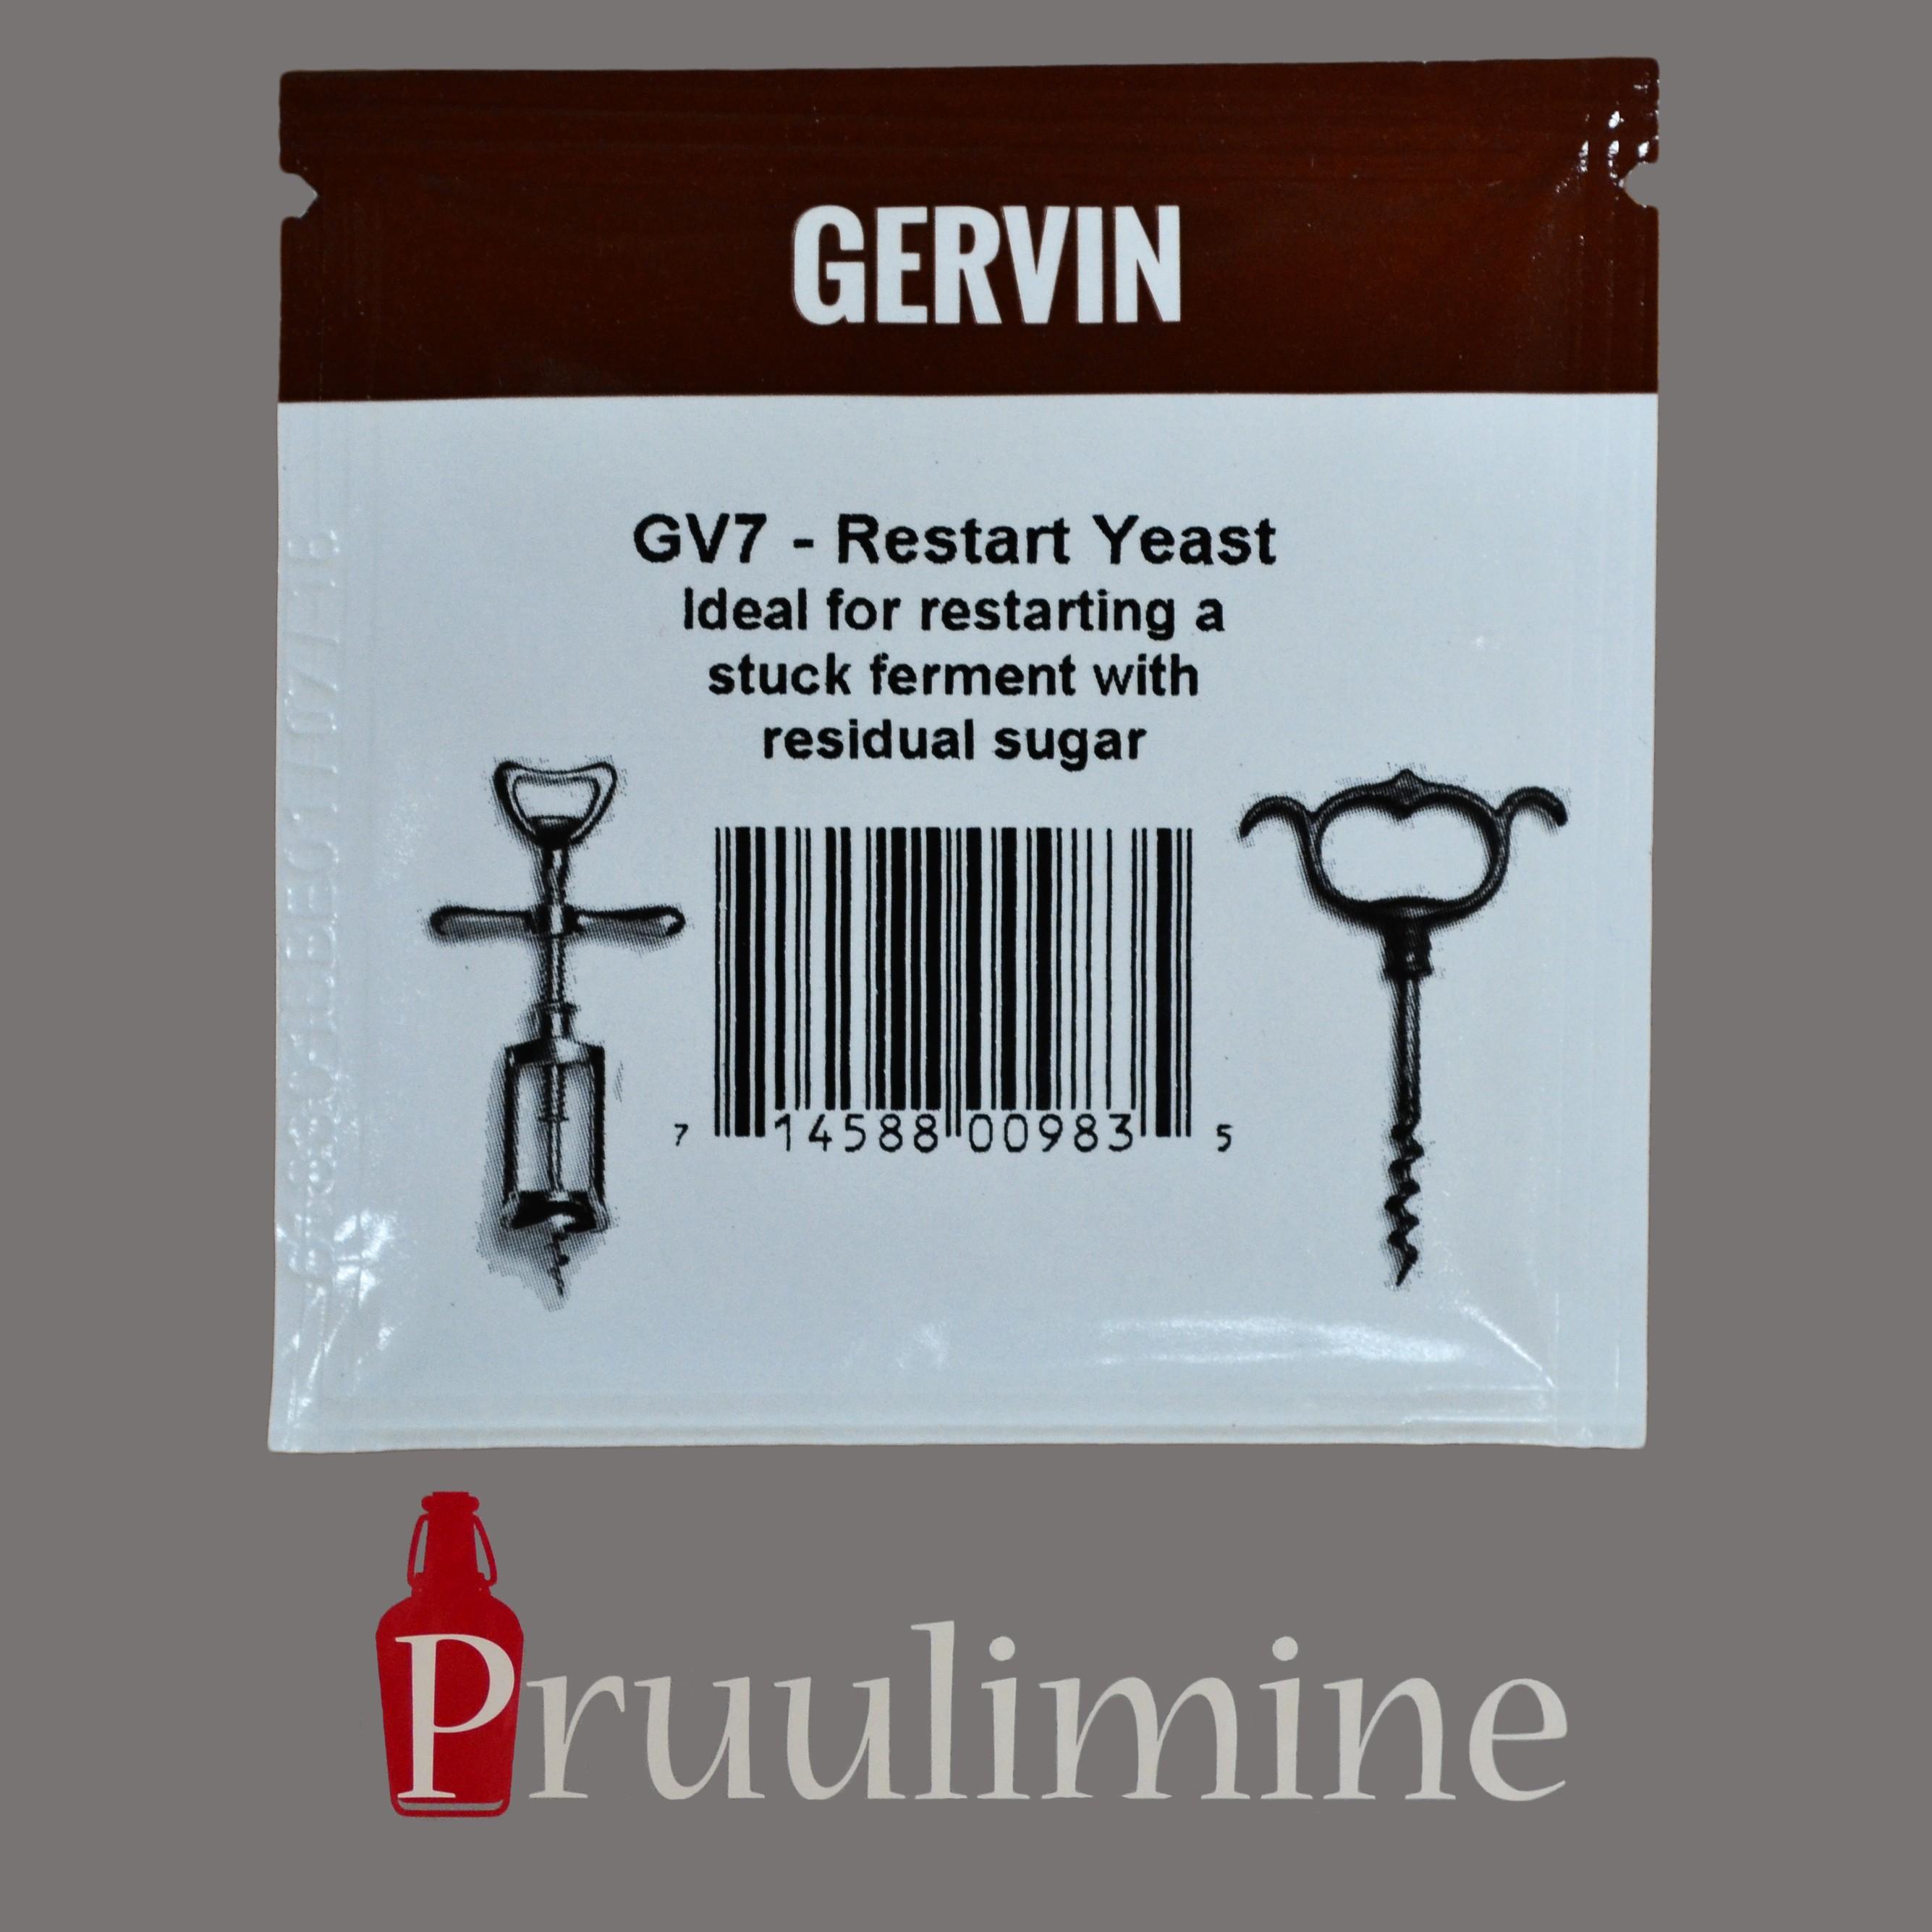 GV7 - Restart yeast